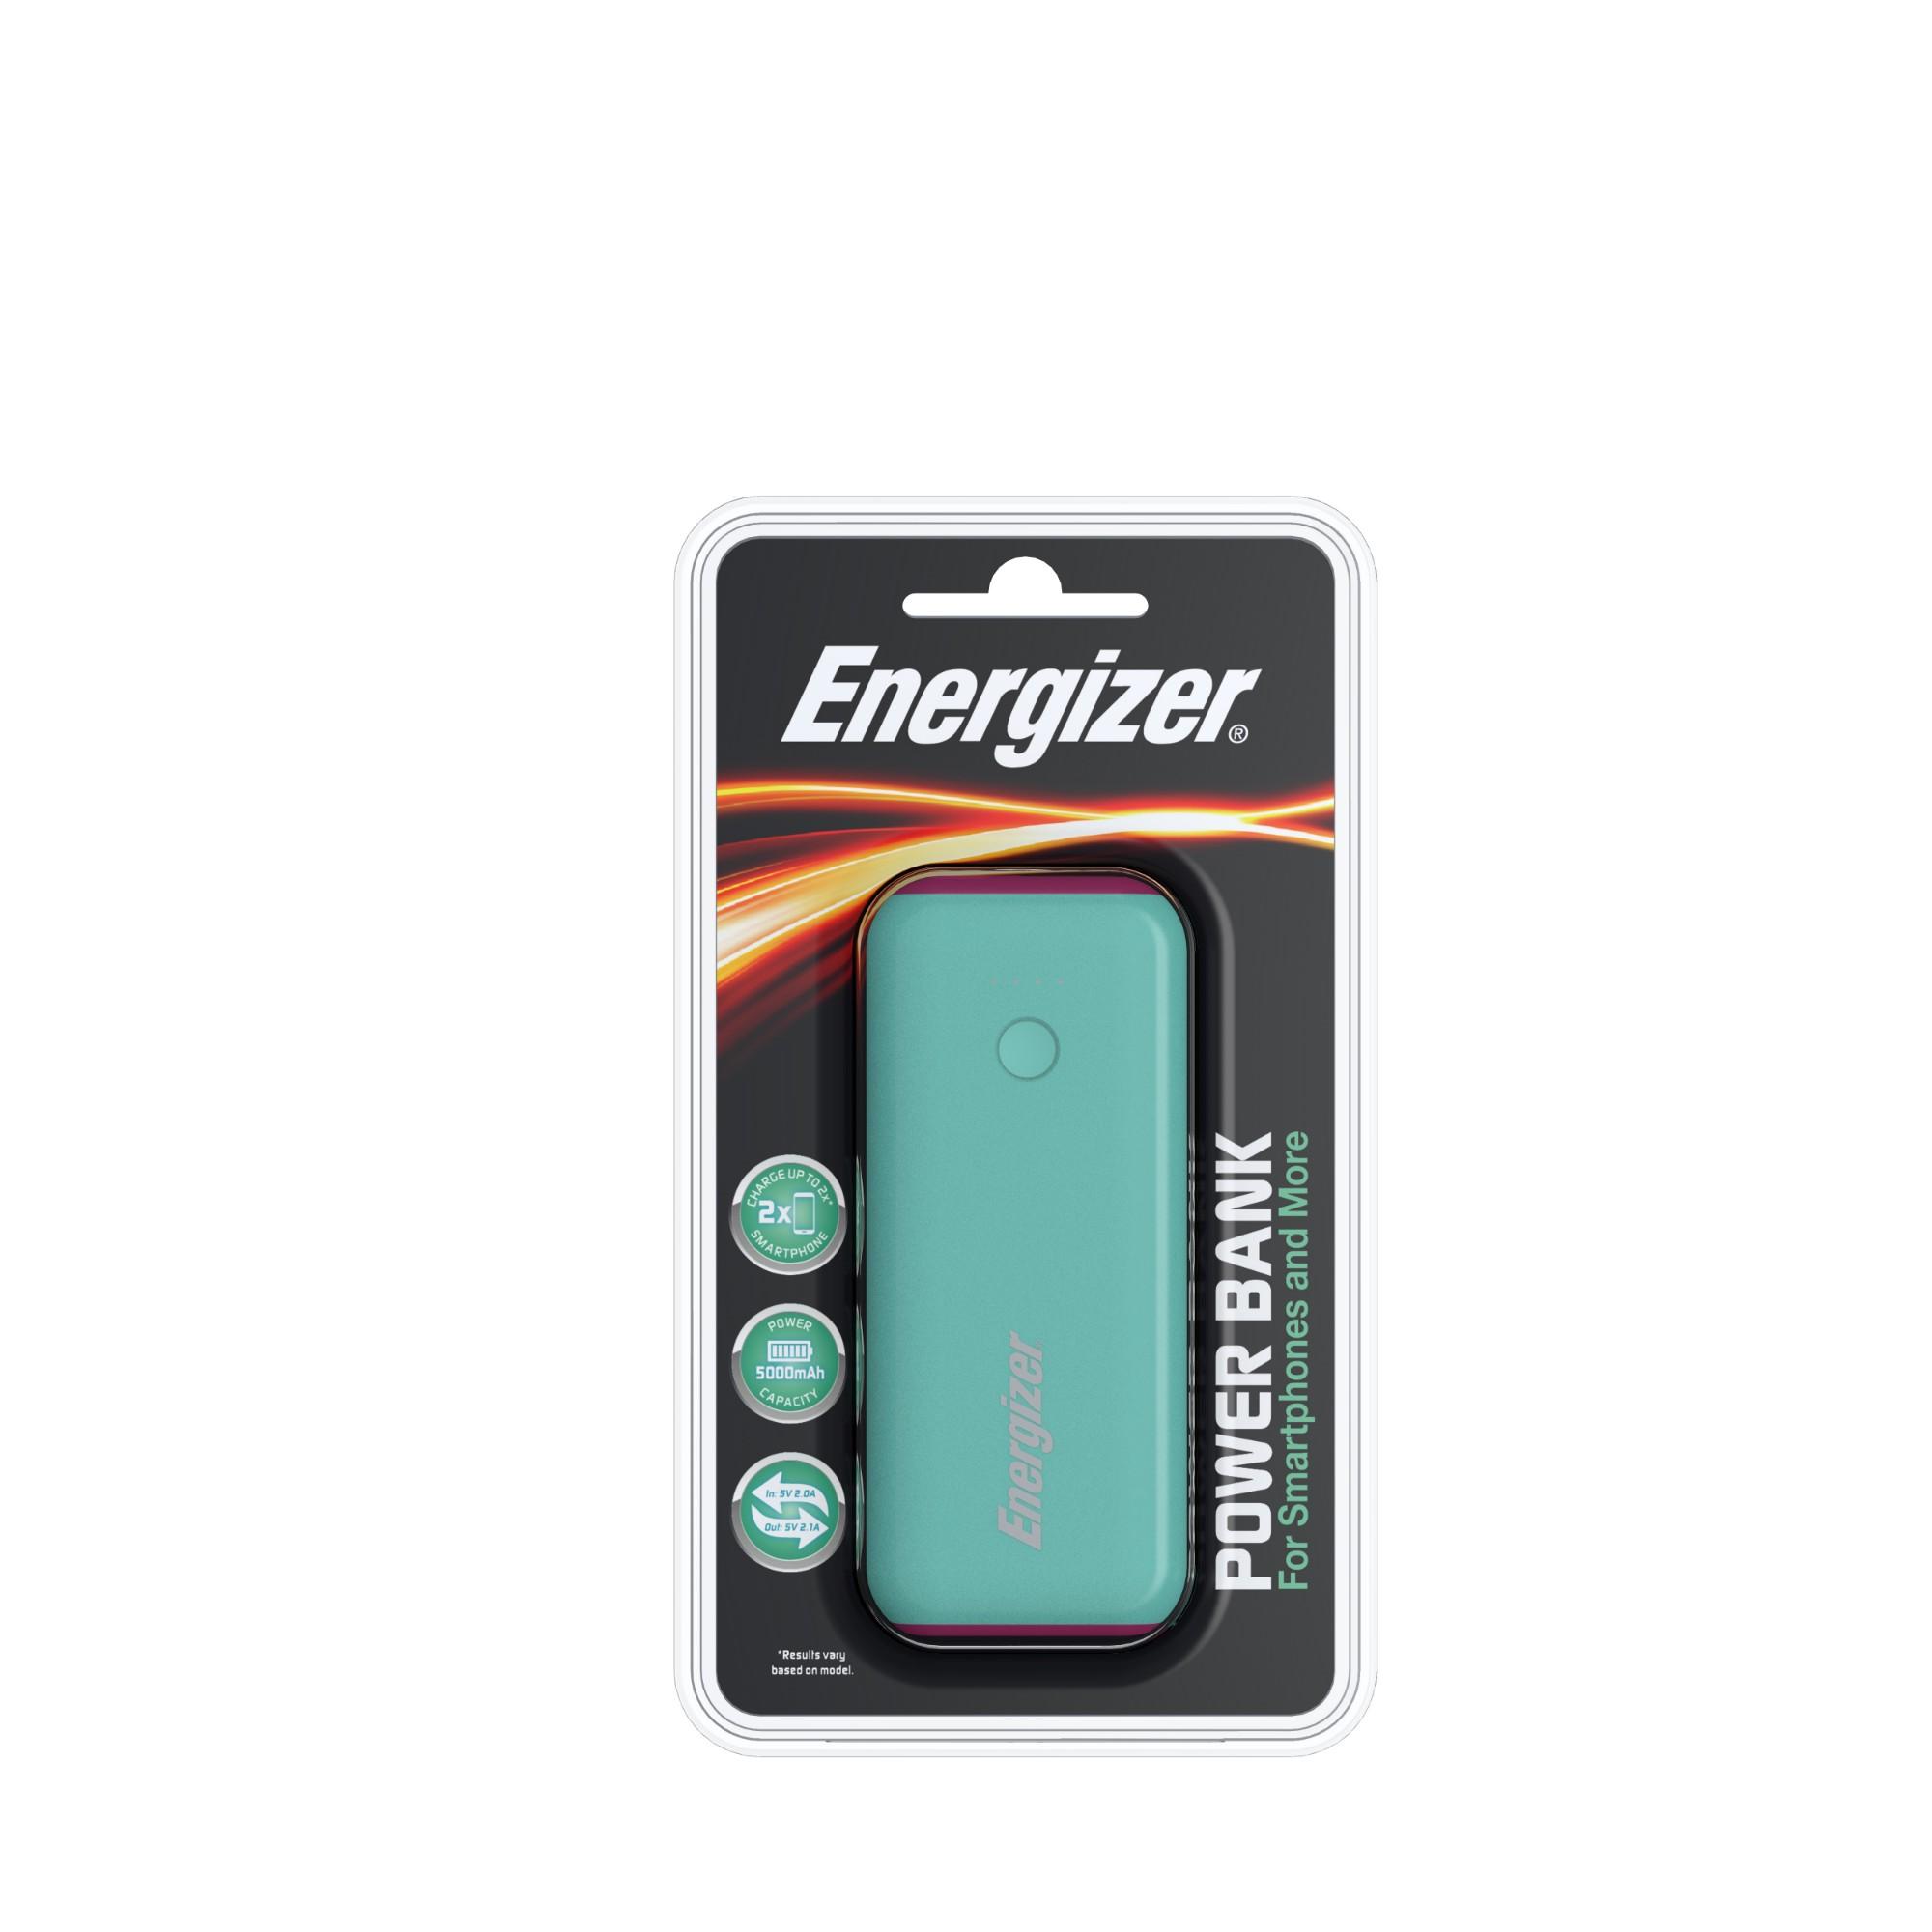 Energizer 5000mAh PowerBank Mint/Magenta